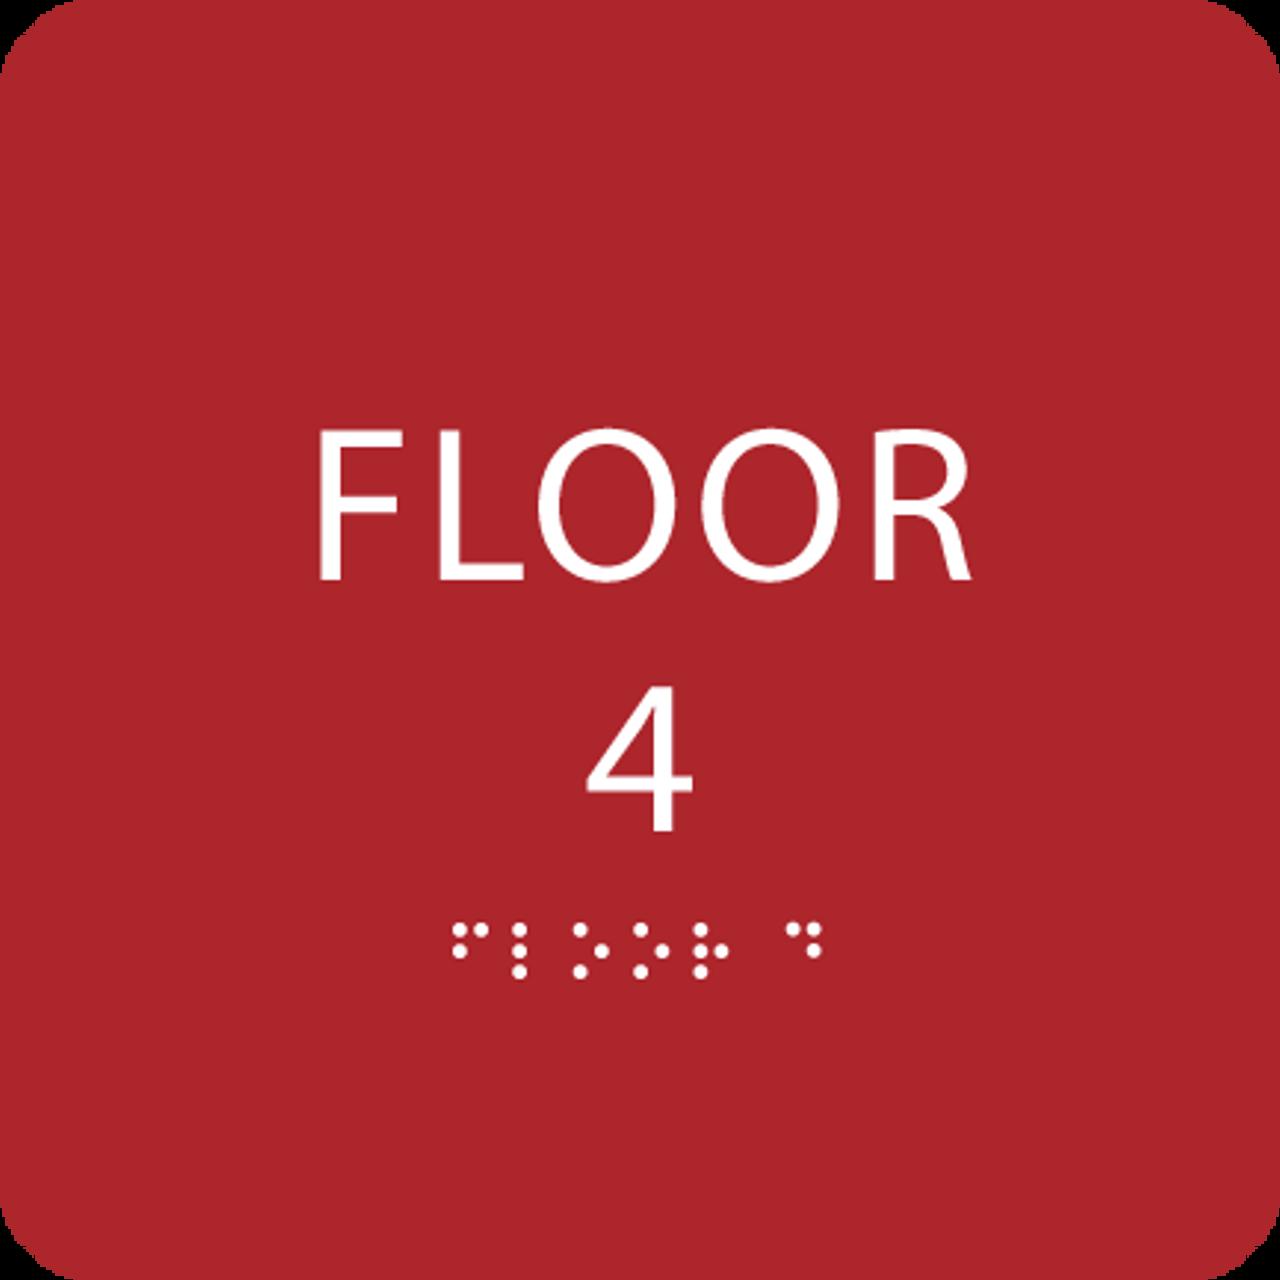 Red Floor 4 Identification Sign